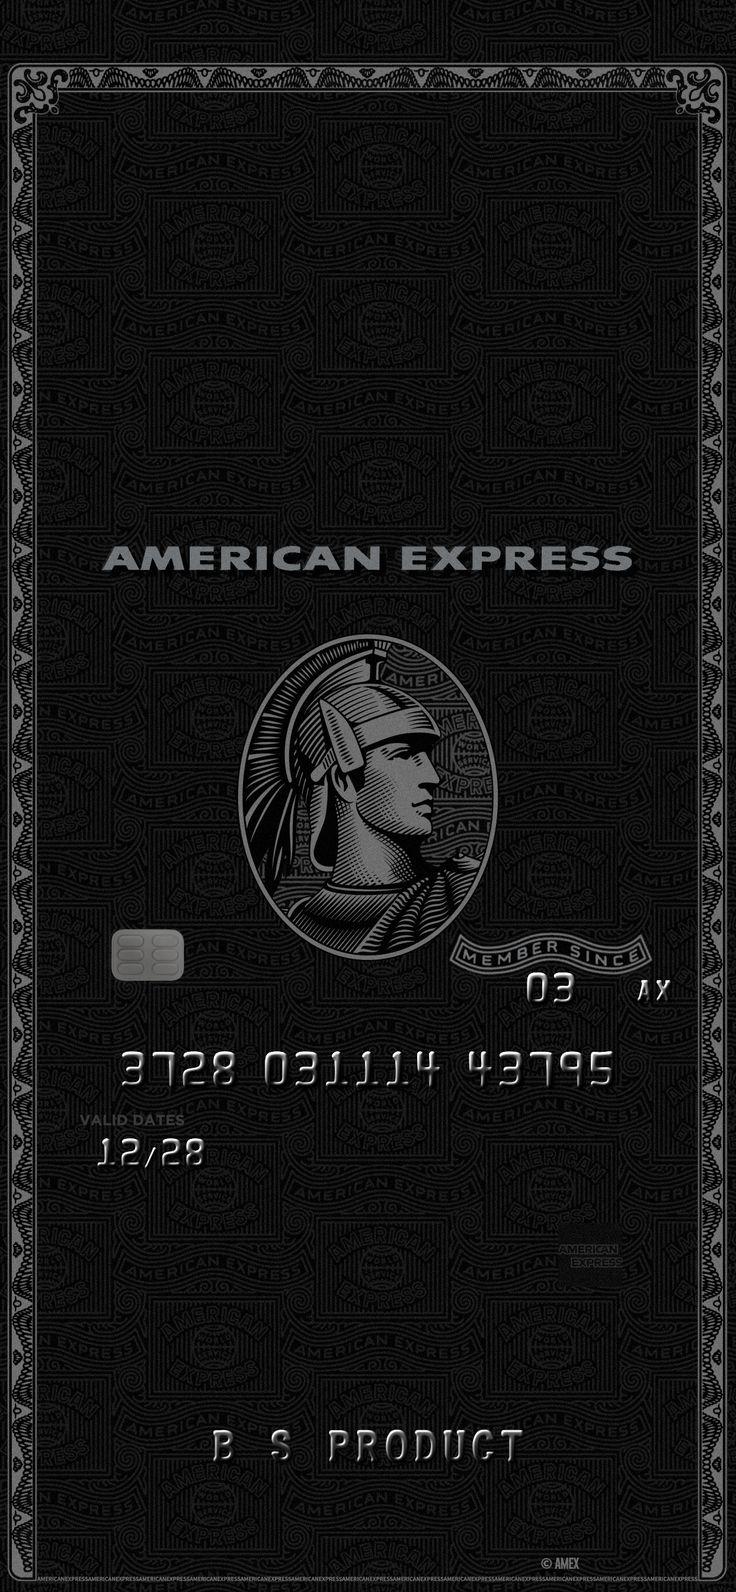 American_express_centurion_card wallpaper 2020 배경화면